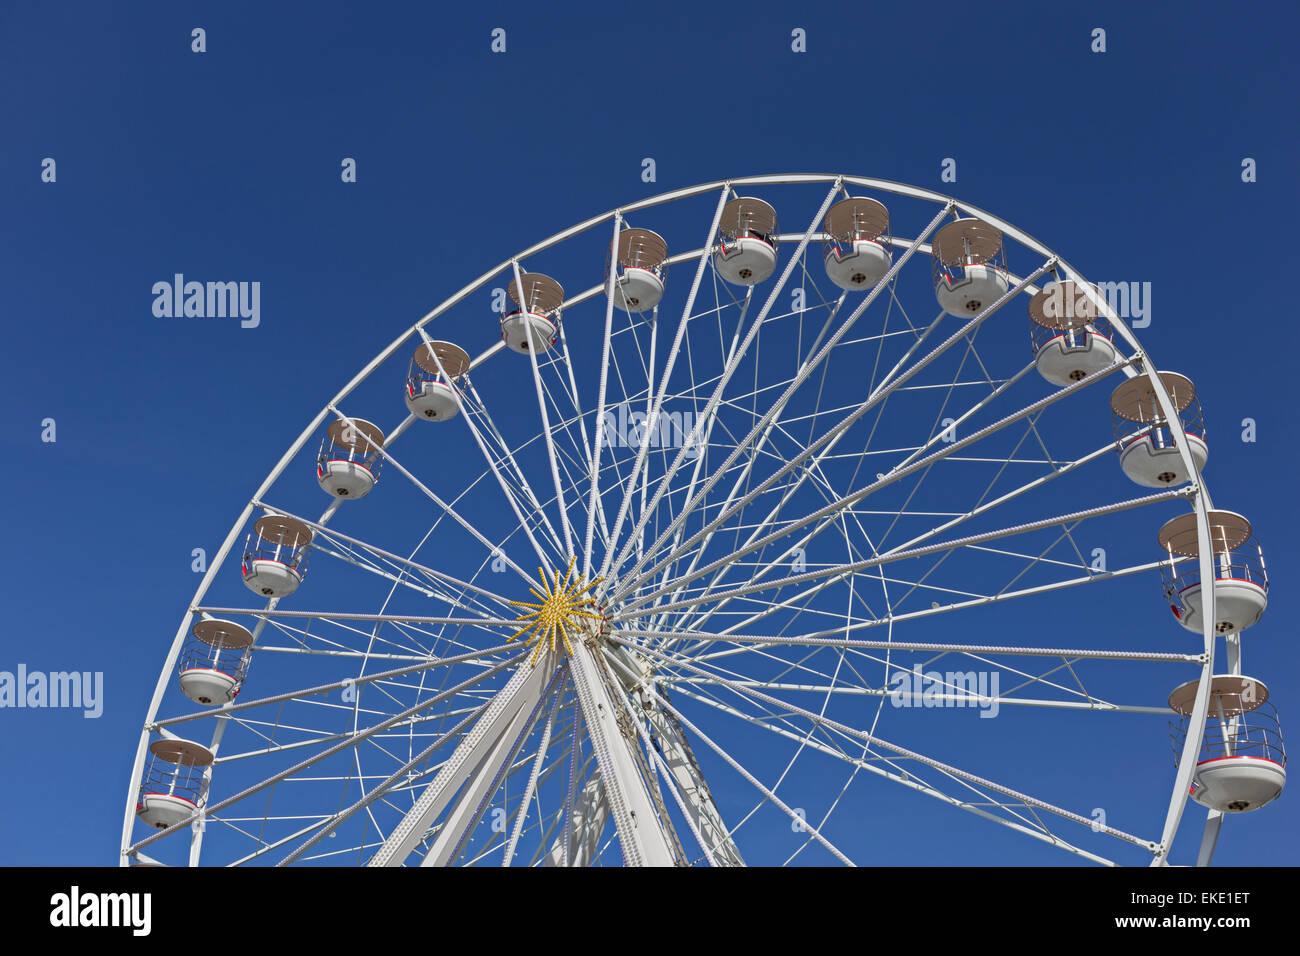 The Weston Wheel, Weston-super-Mare, Somerset, England - Stock Image